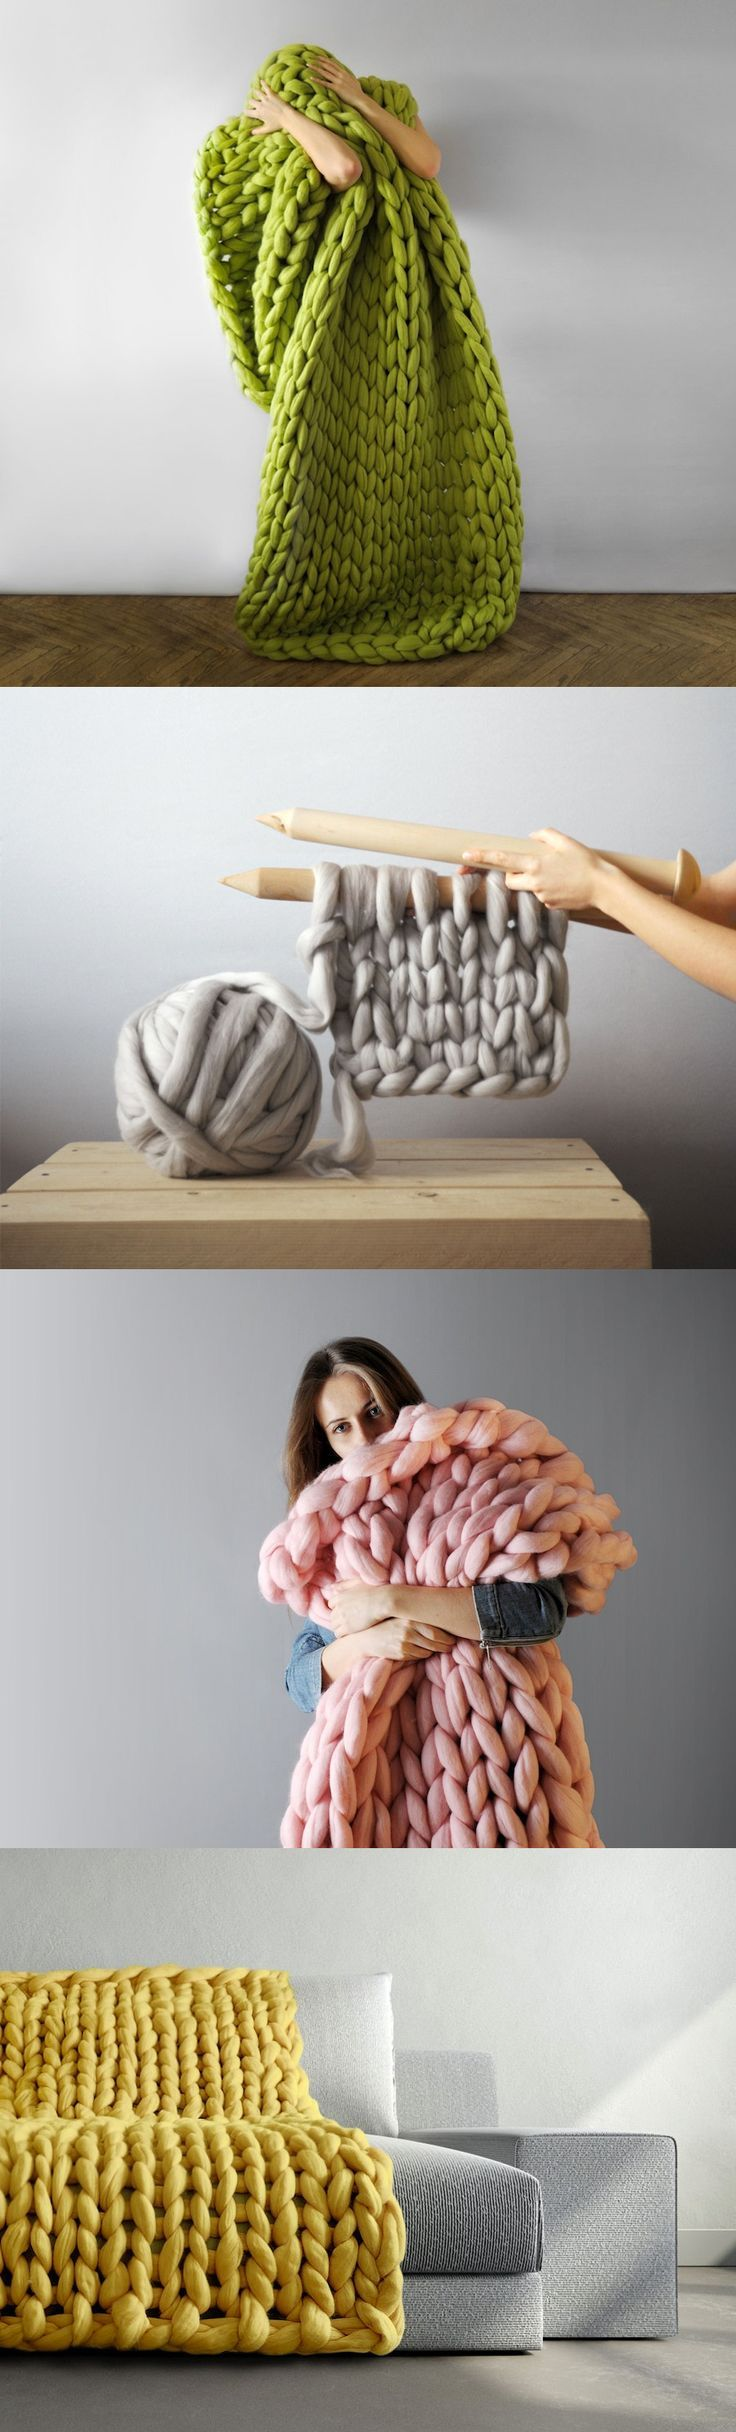 Chunky knits by Ana mo